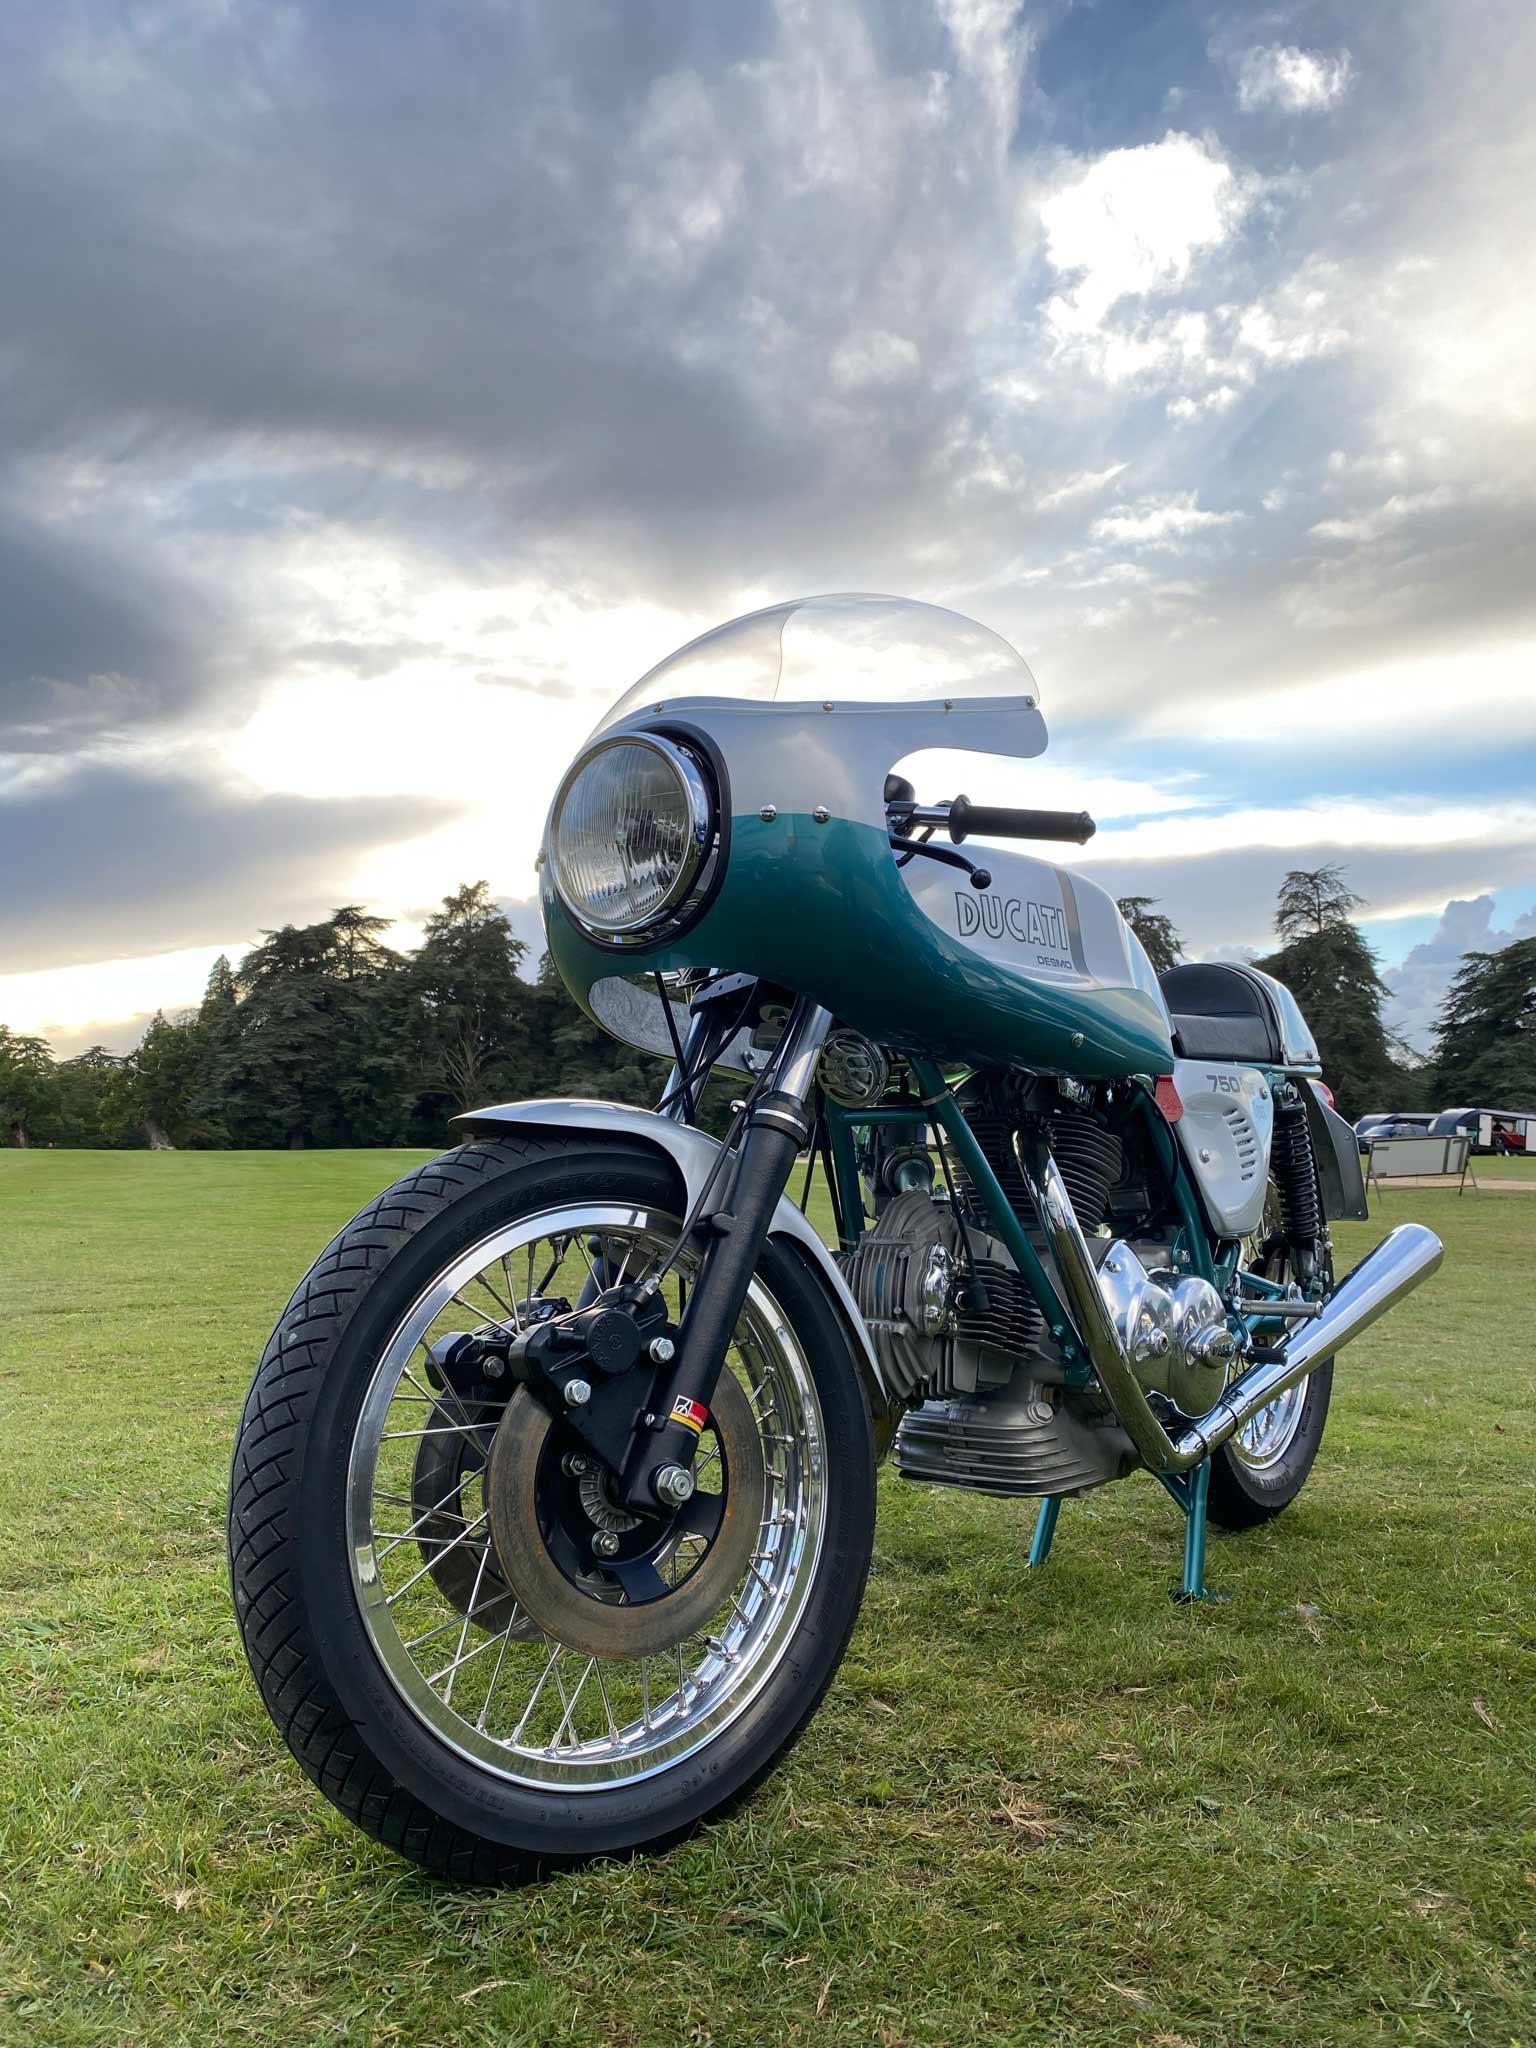 Ducati restoration specialist London